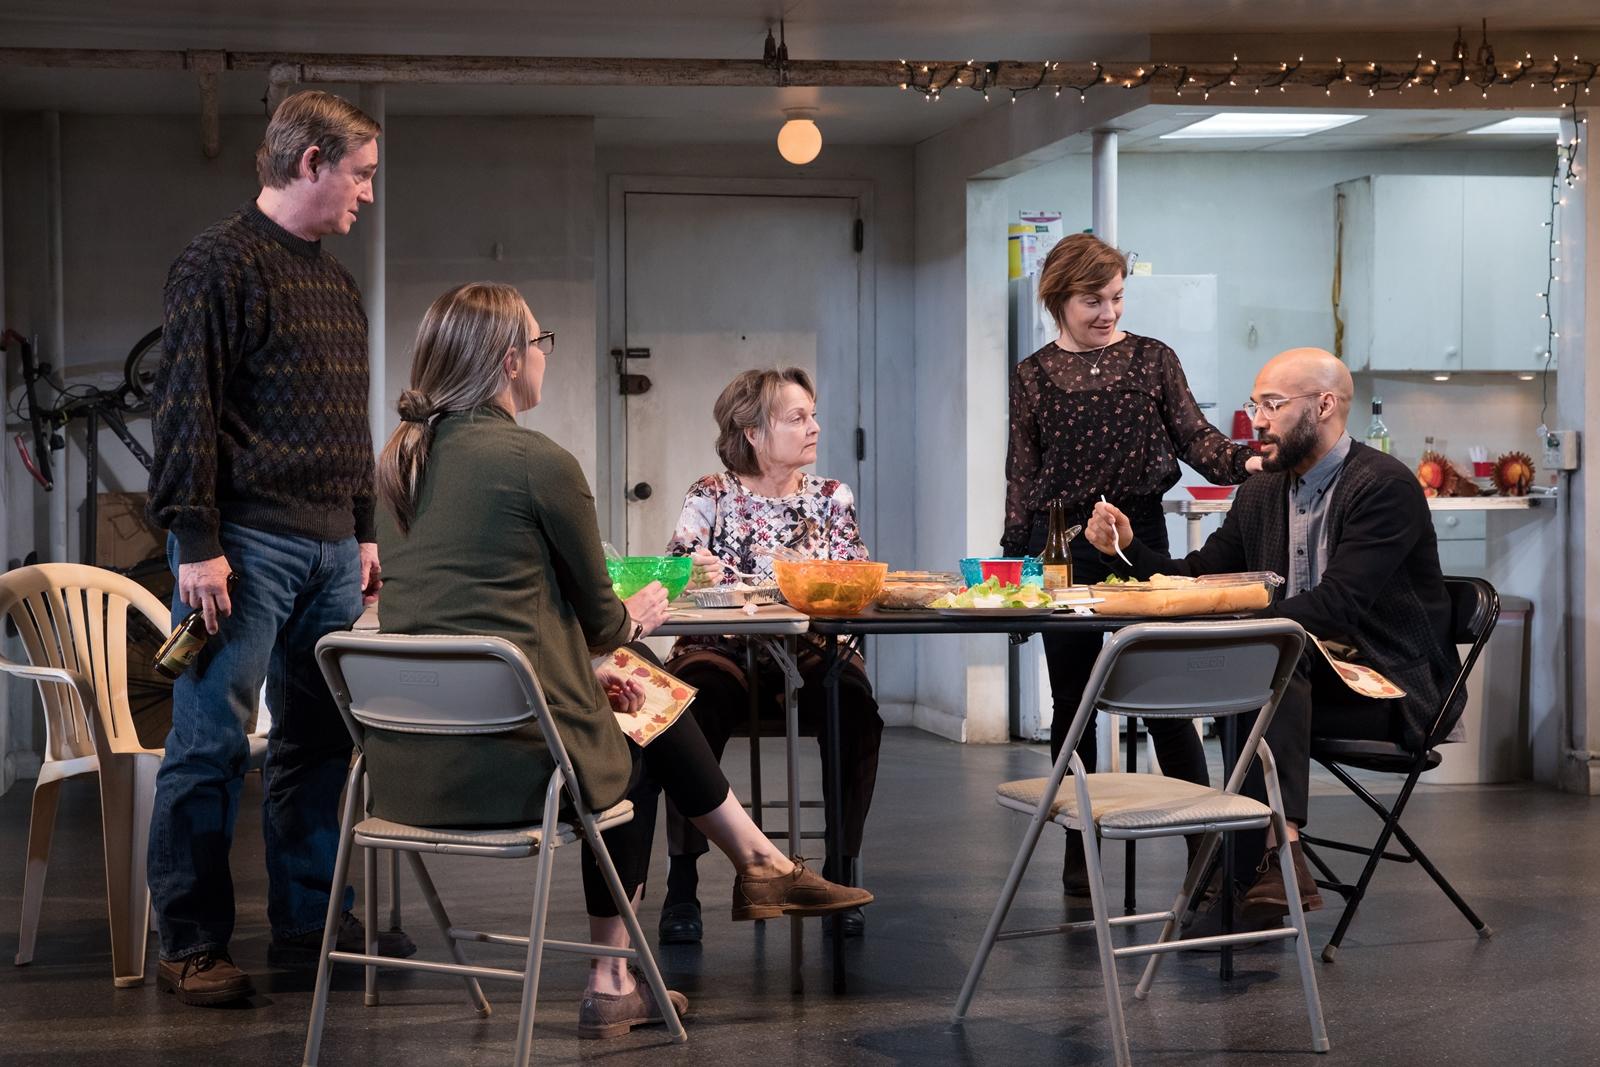 El elenco de The Humans. Luis Vega aparace a la derecha en la cabecera de la mesa. De izq. a der: Richard Thomas, Pamela Reed, Daisy Eagan y Therese Plaehn.